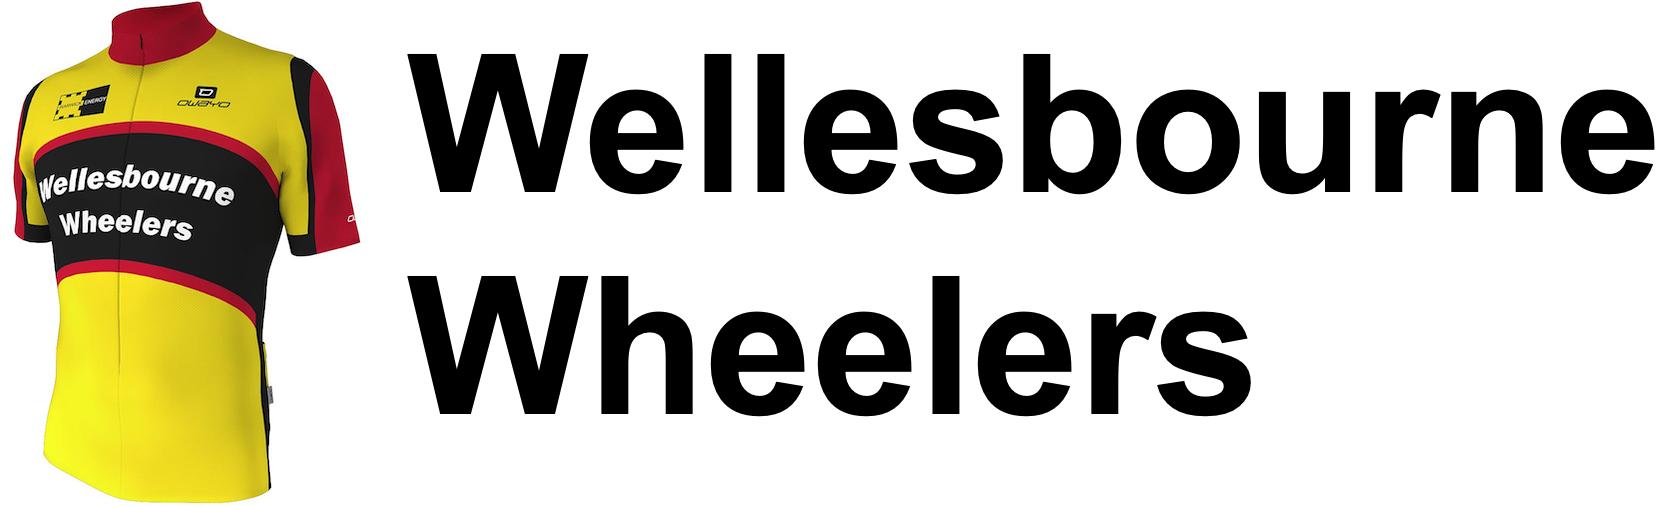 Wellesbourne Wheelers : British Cycling Affiliation No: 1001851